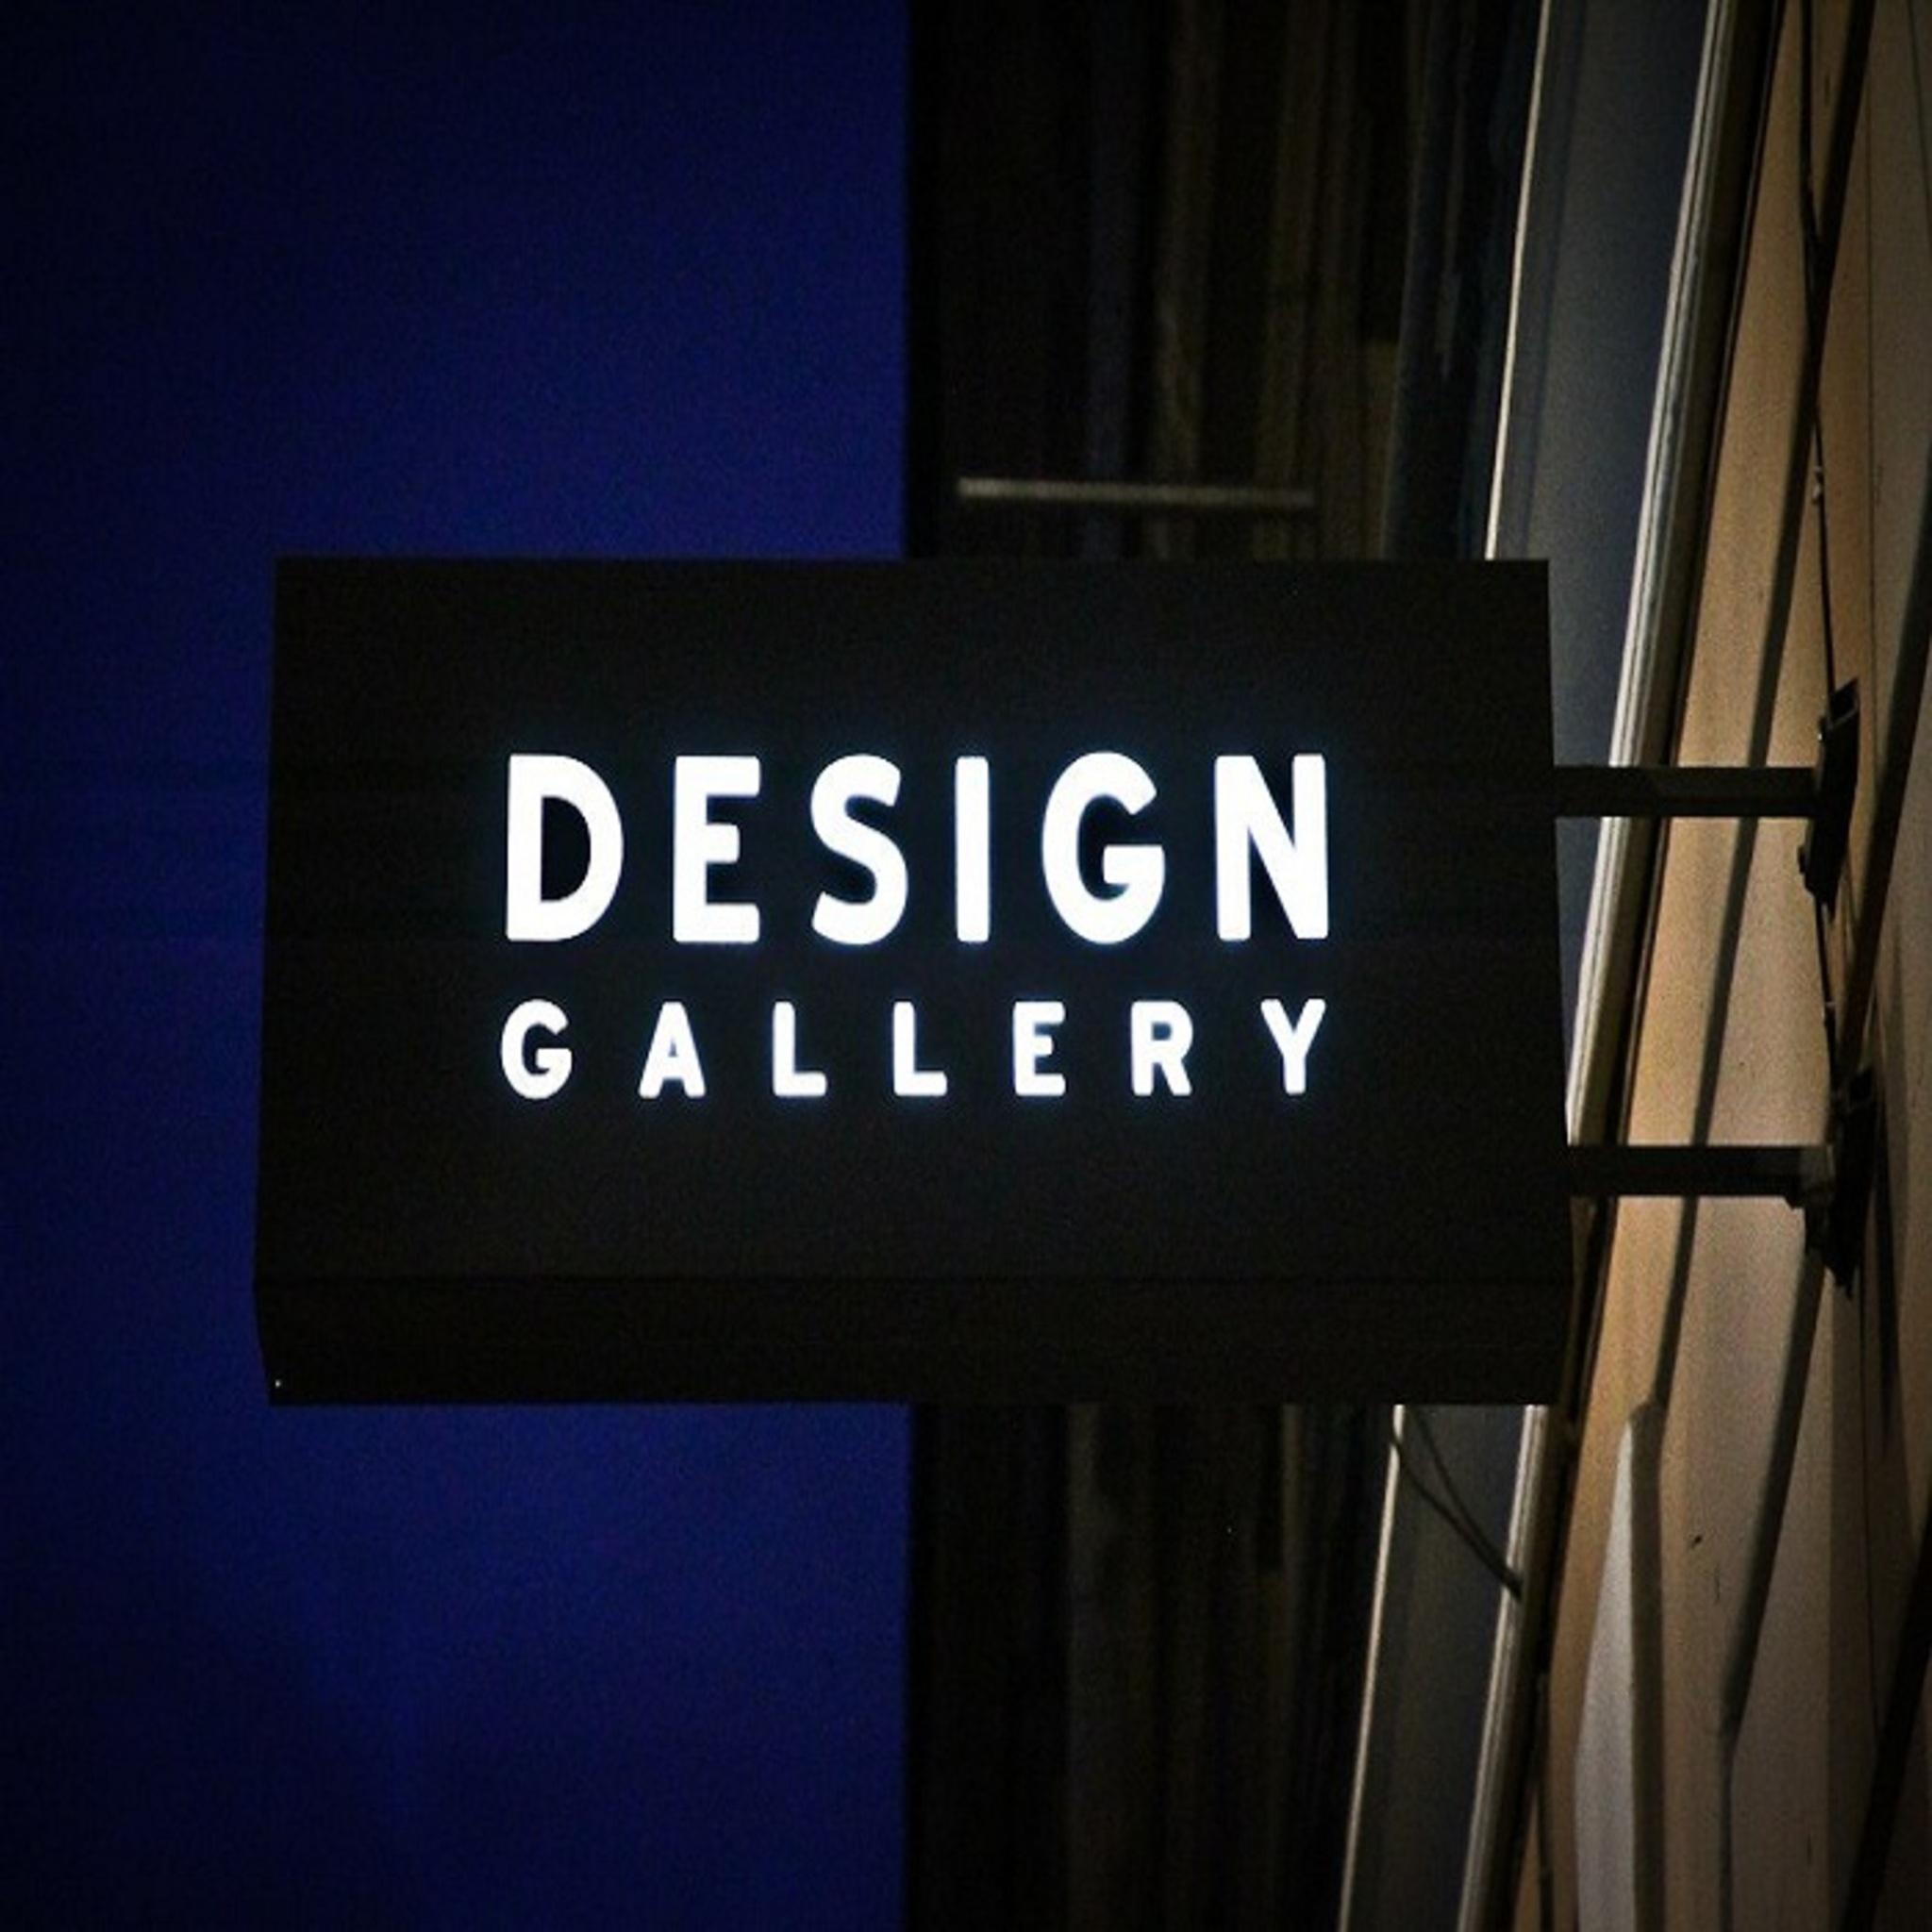 Design gallery/bulthaup